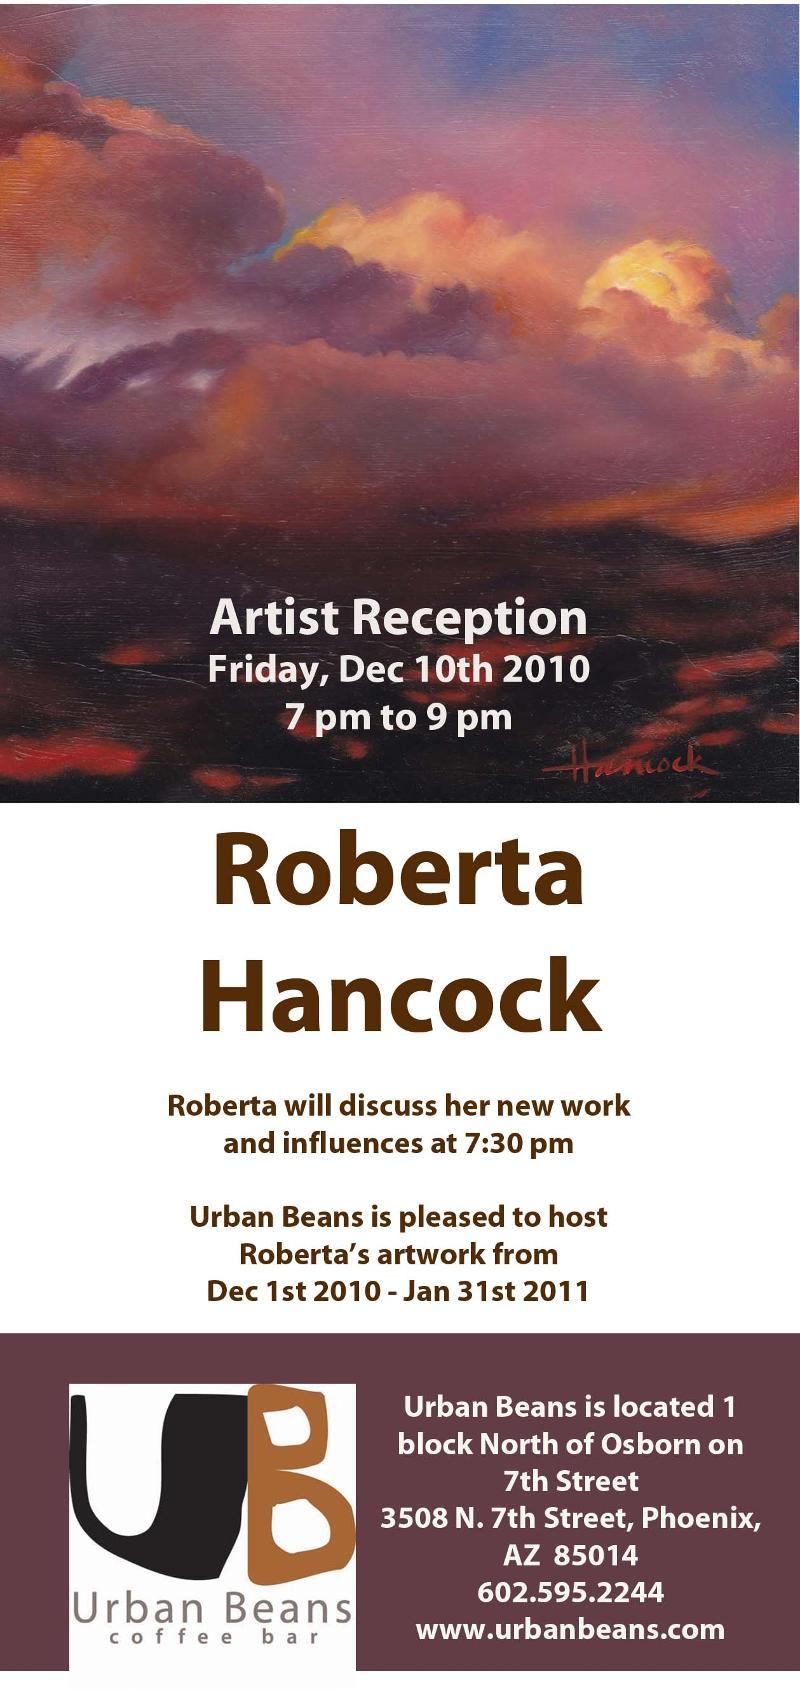 Roberta Hancock at Urban Beans